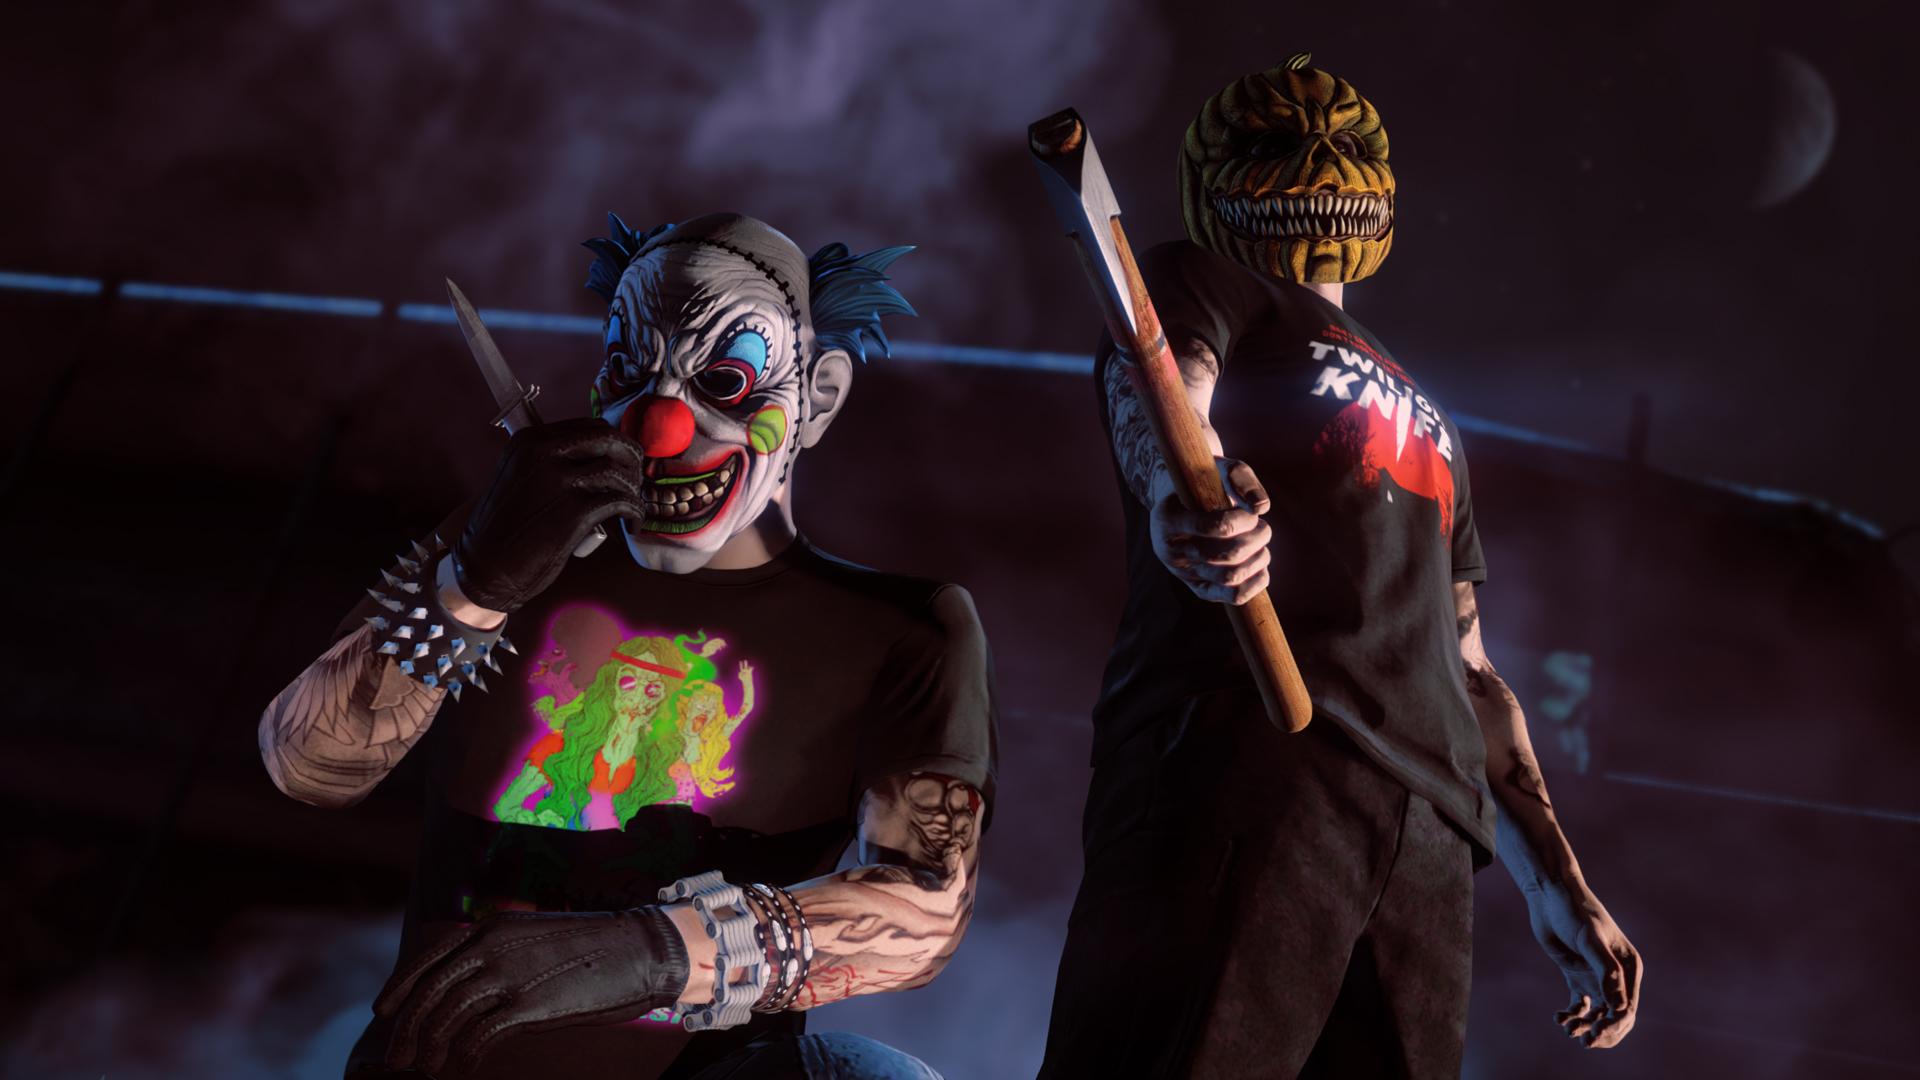 Halloween 2018 in GTA Online -- kostenlose Skins, 2fache GTA$ & RP in Halloween-Modi + Ingamerabatte